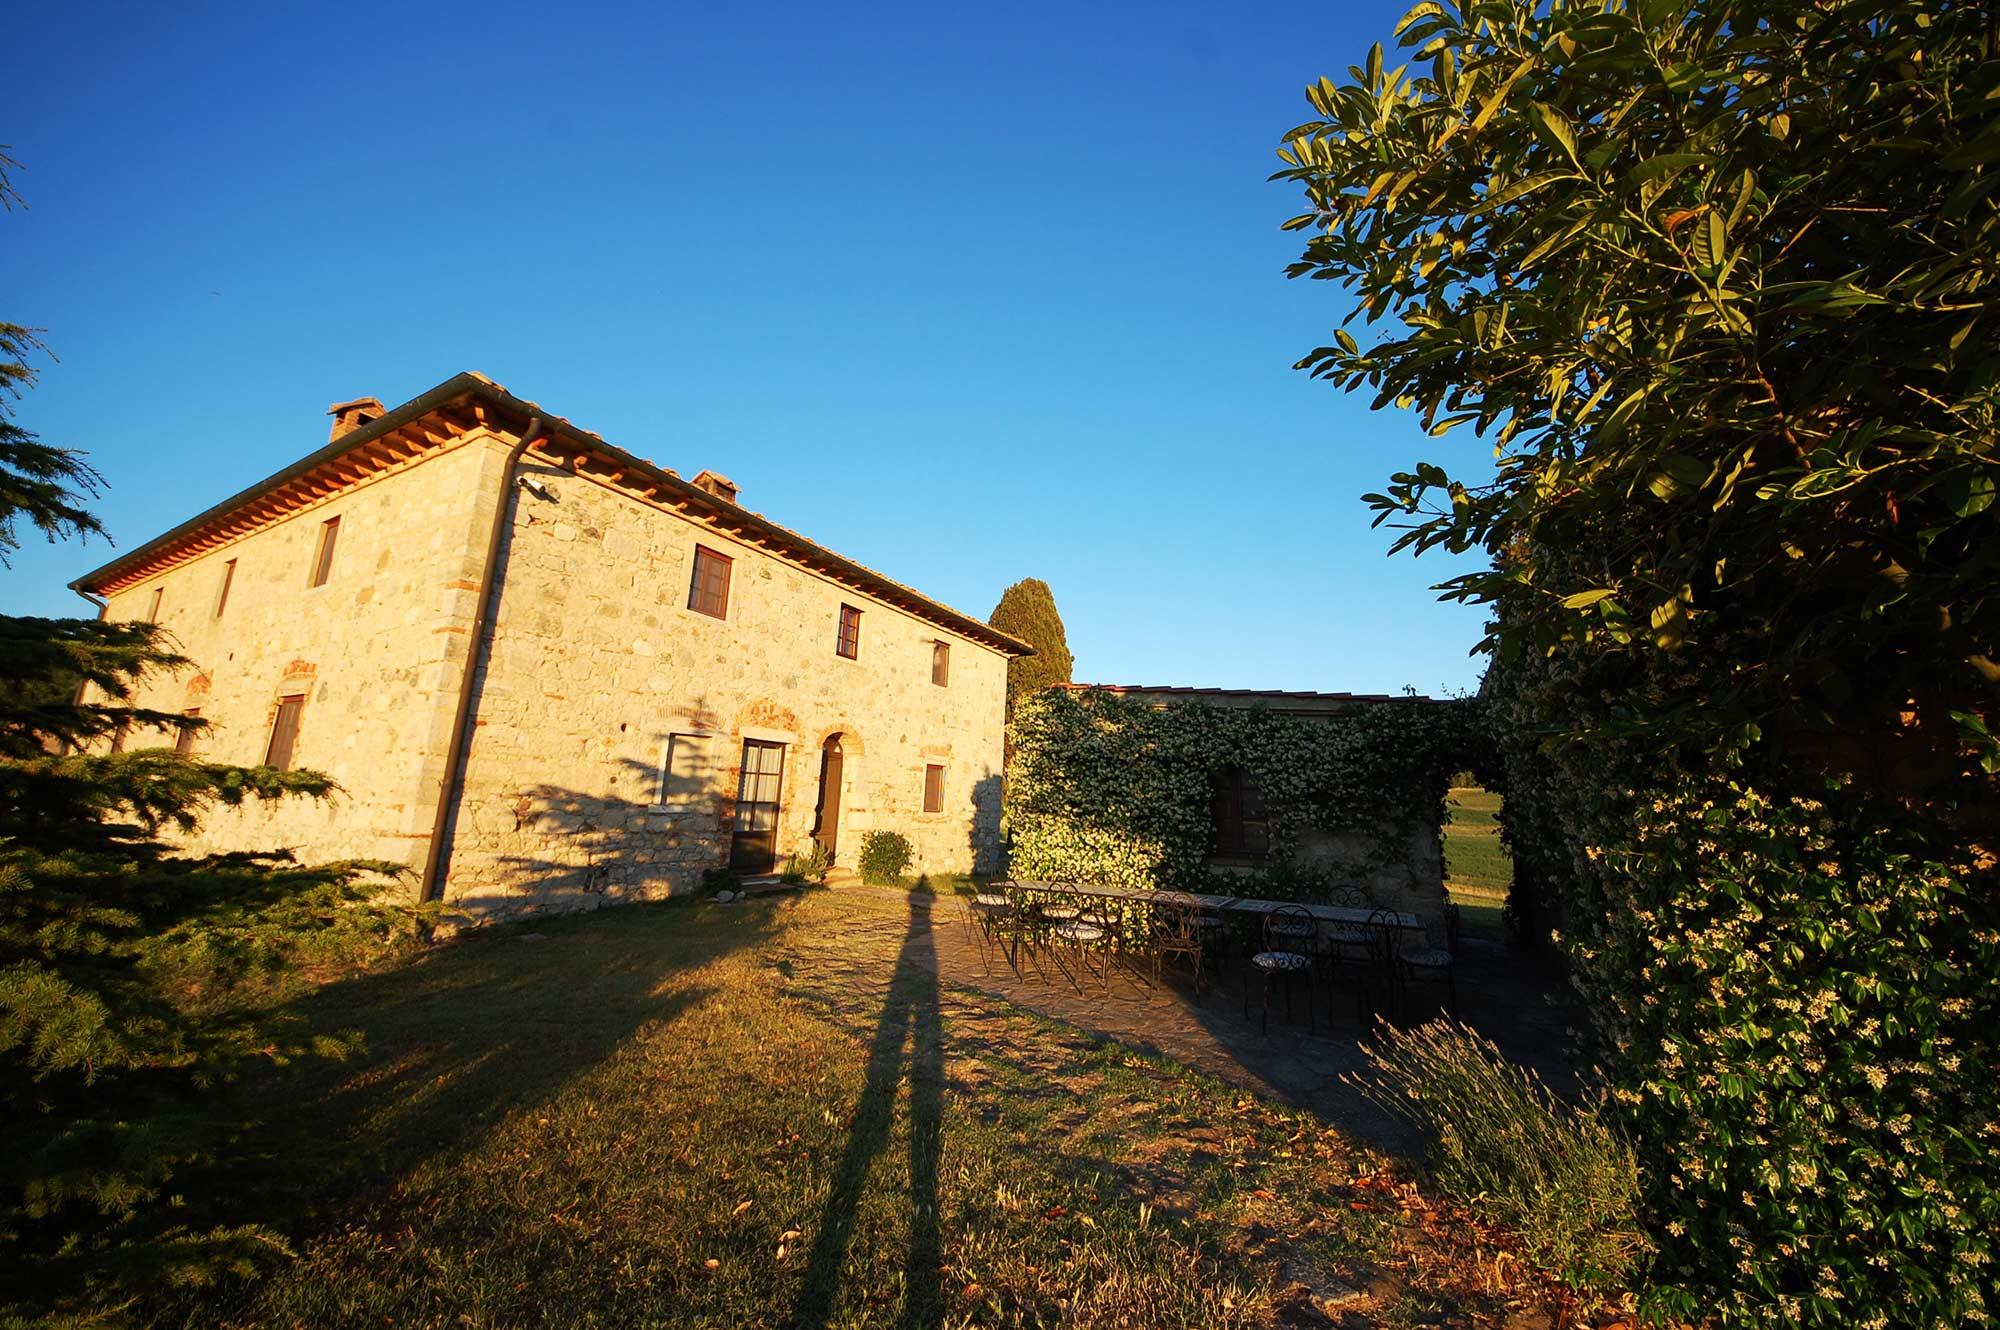 tuscany villa 2 weeks